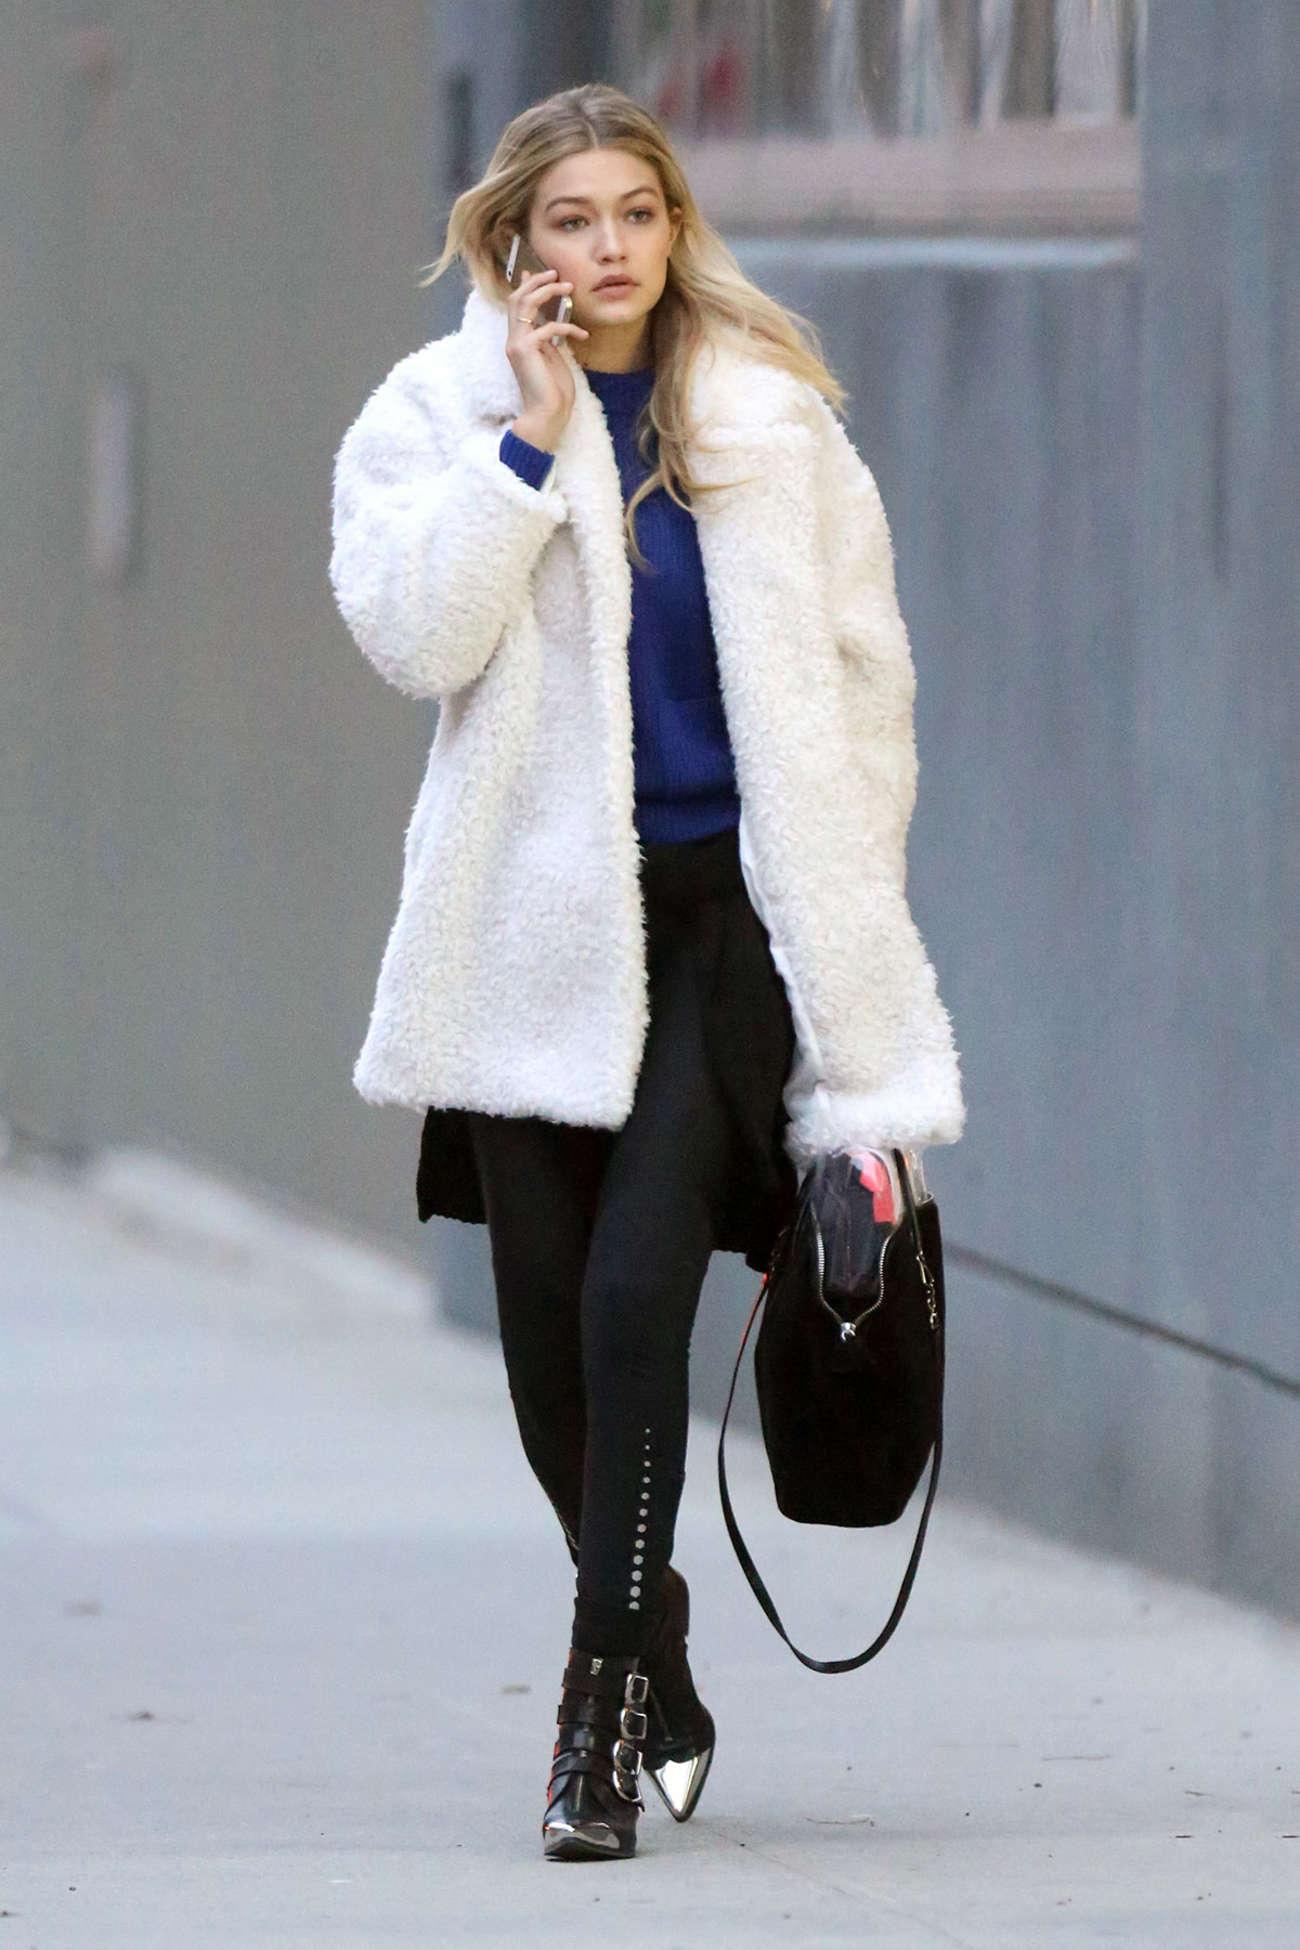 Gigi Hadid in Mini Skirt at Tribeca Photo Studio in NYC